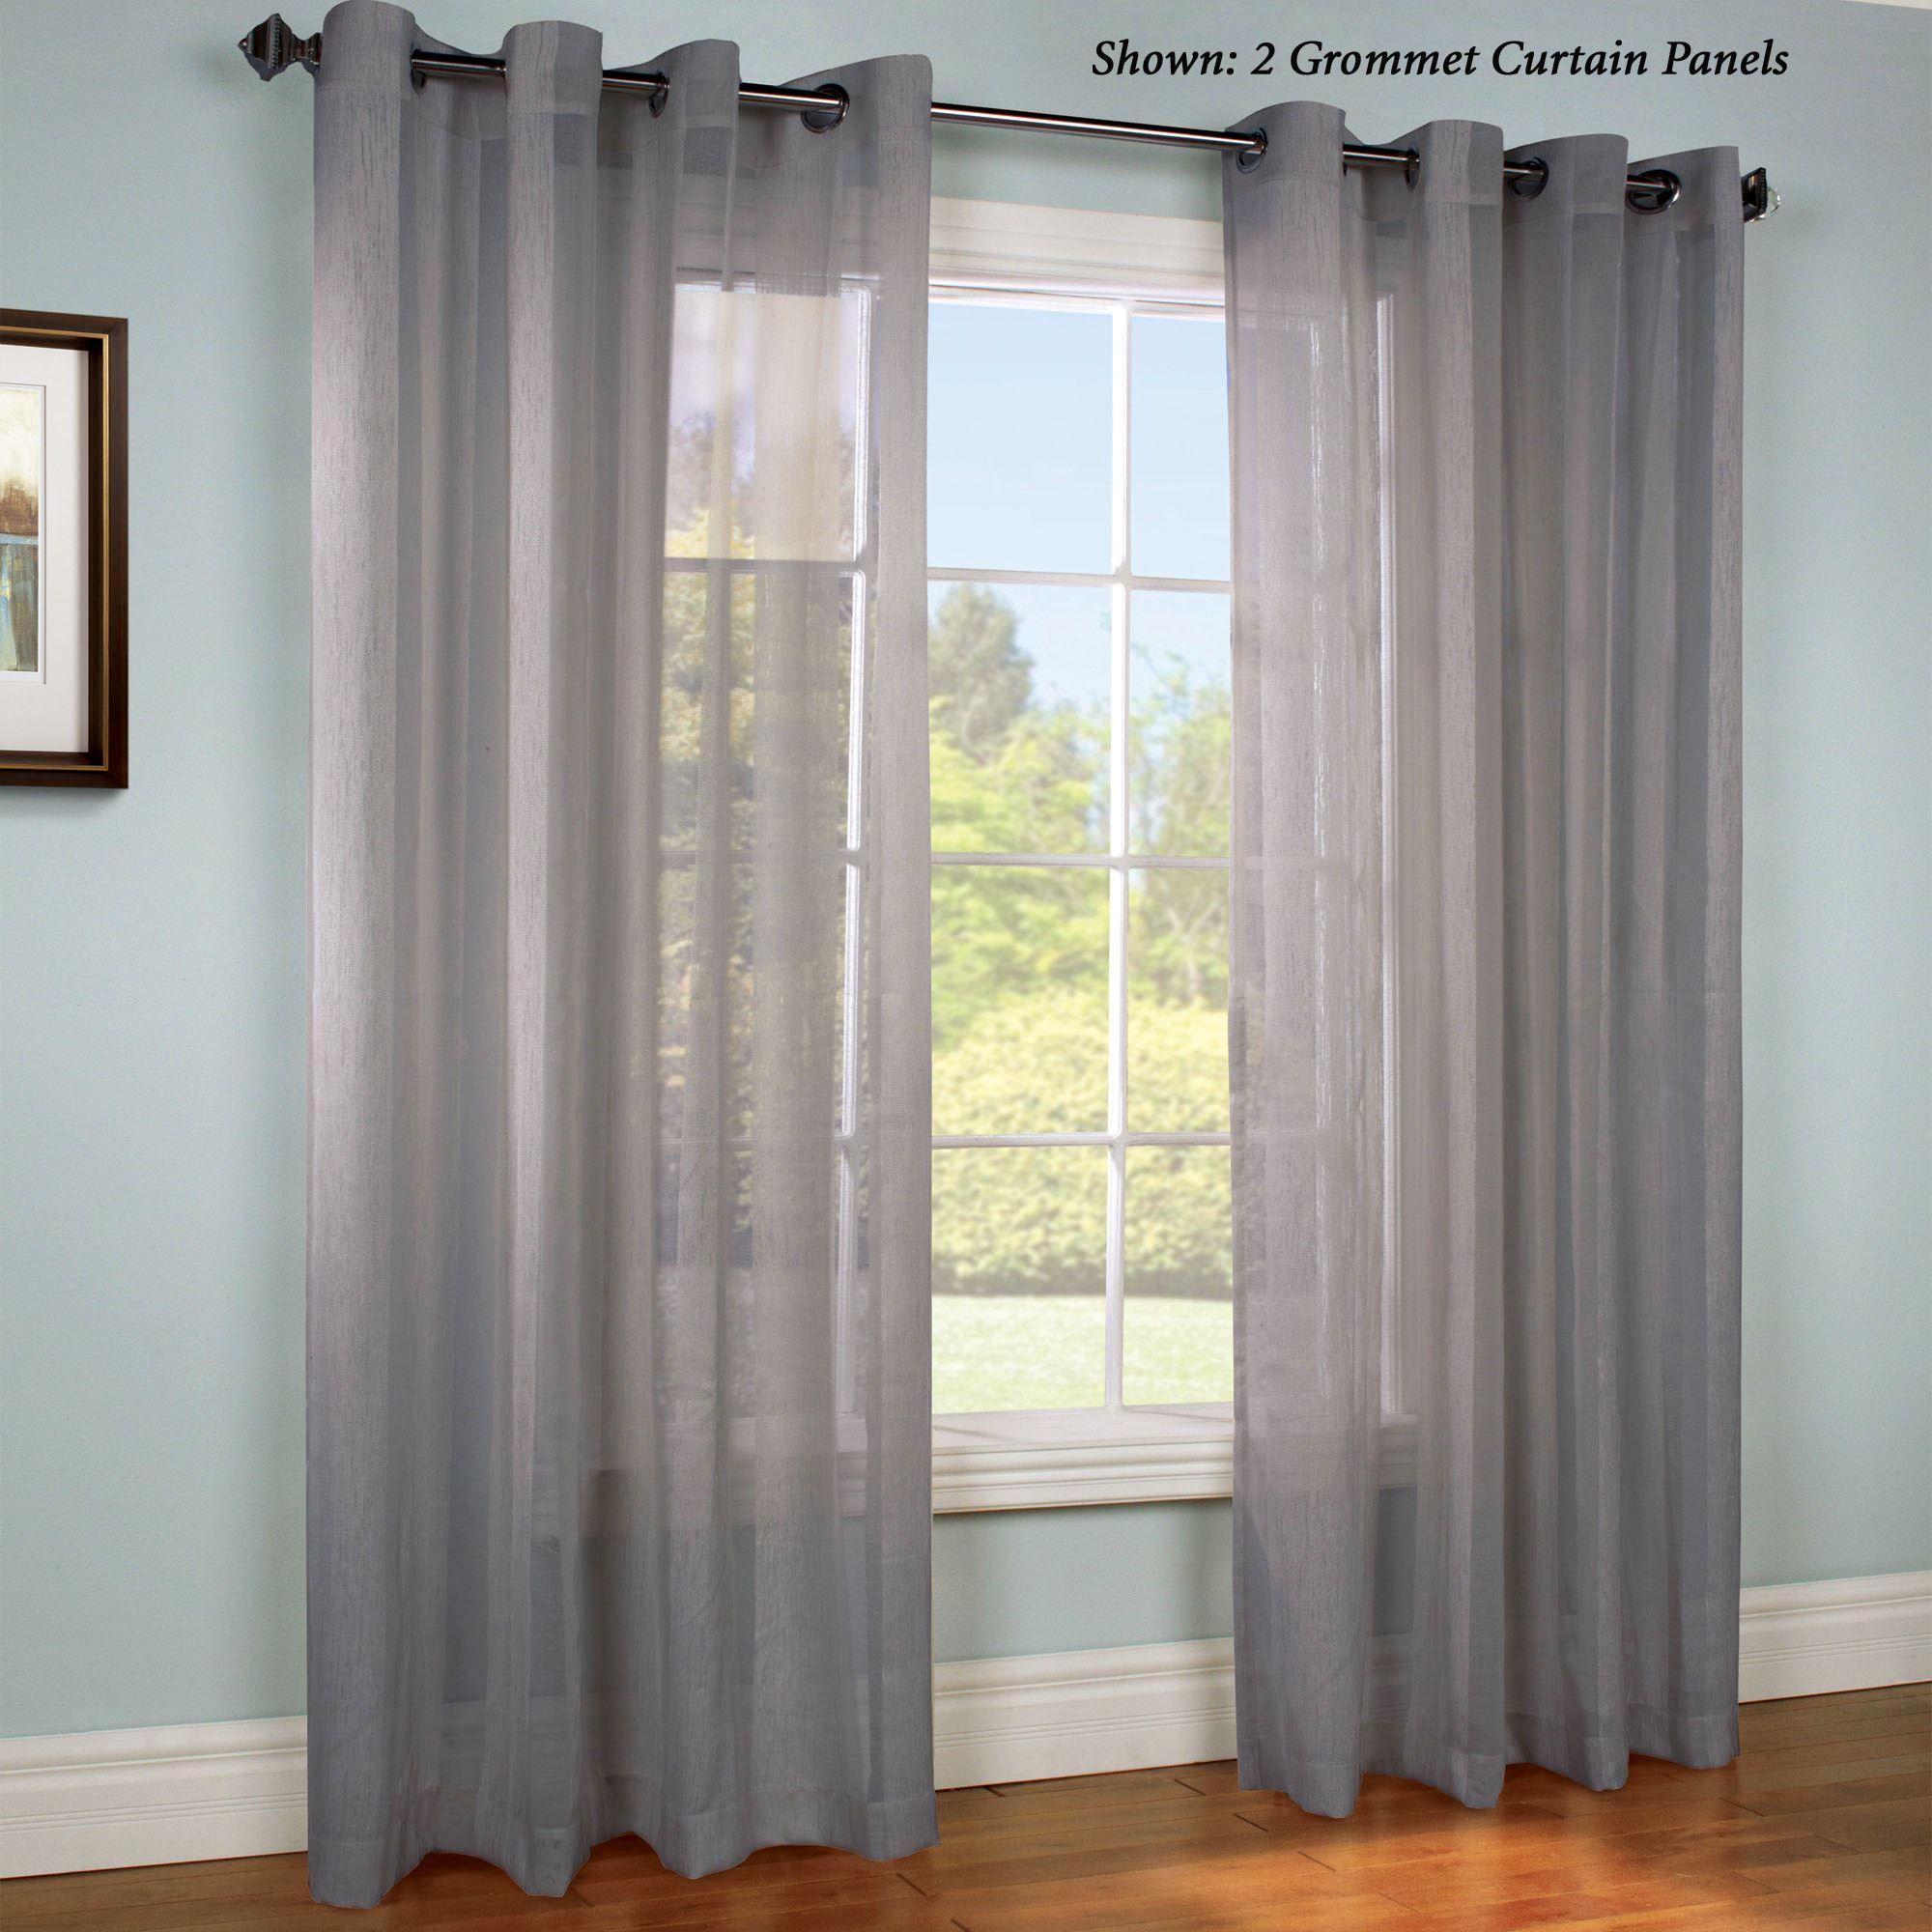 Stellan Dark Gray Striped Sheer Grommet Curtain Panels